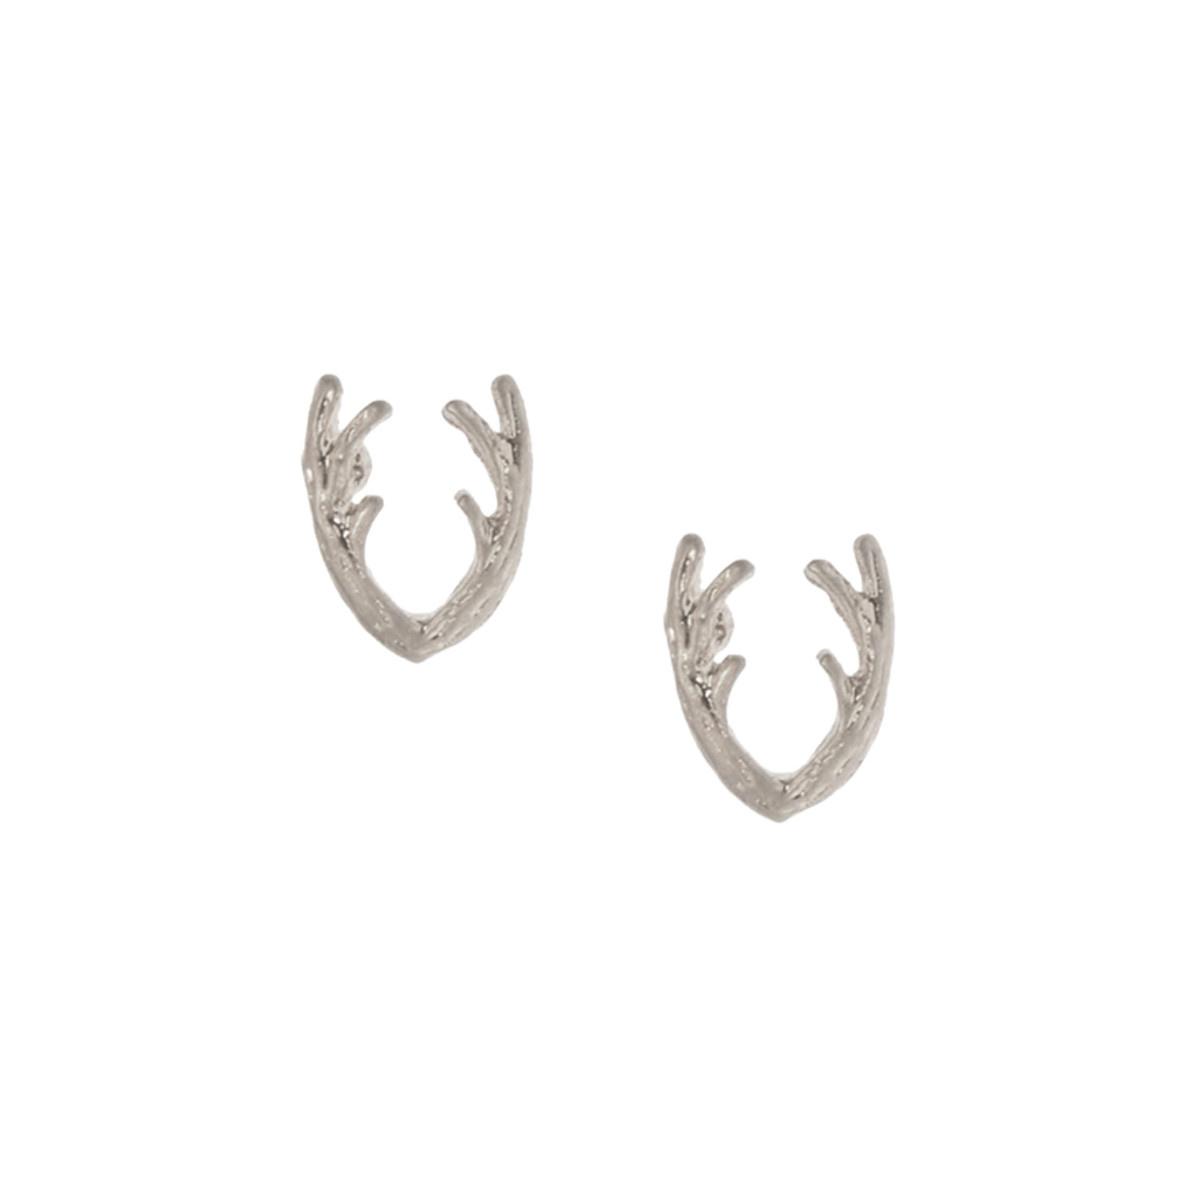 Joy Susan Joy Susan Antler Post Earrings Silver